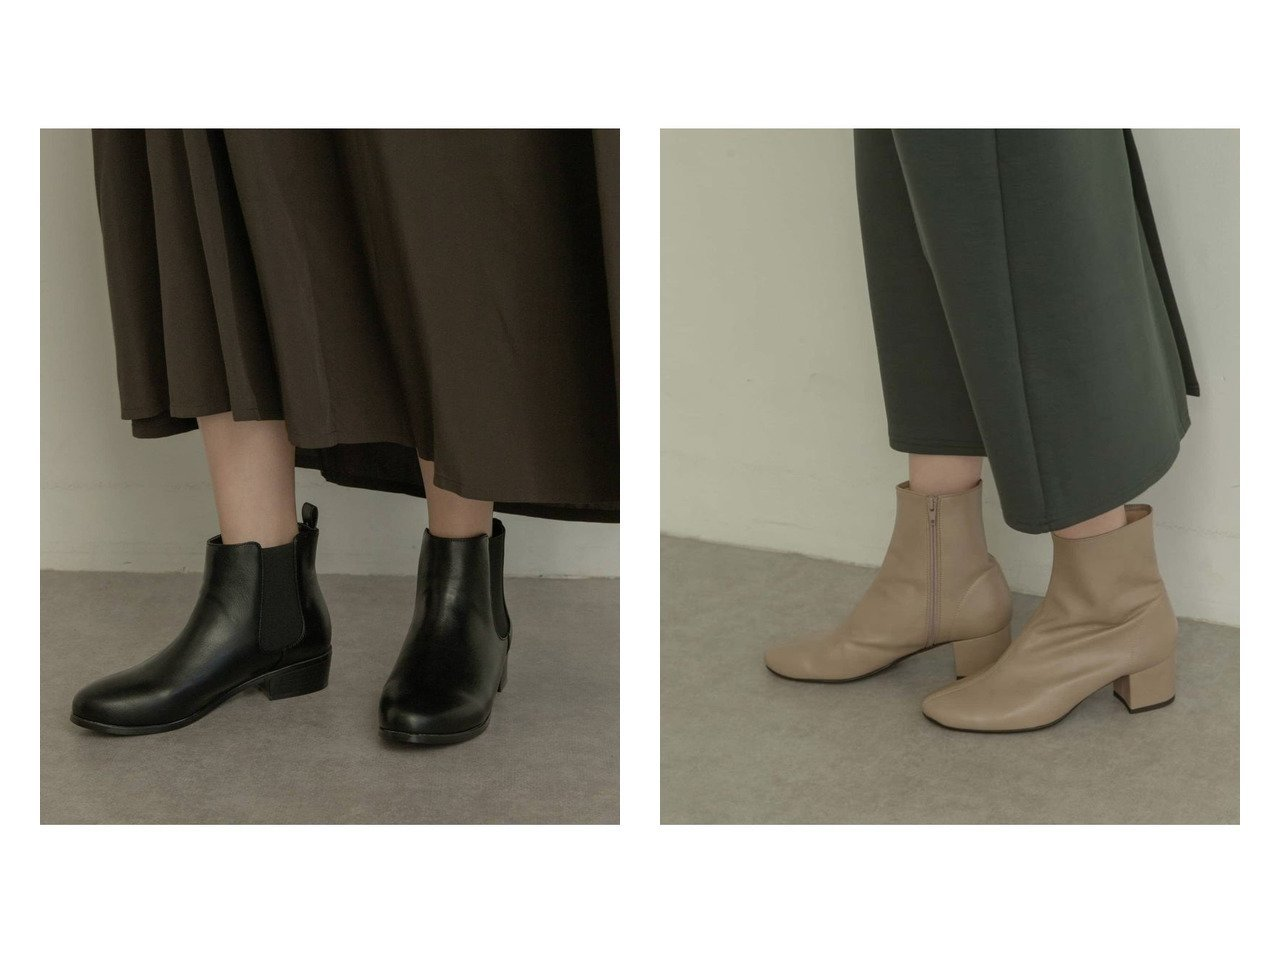 【RODE SKO/ロデスコ】のEMELINA プレーンブーツ&HELKA サイドゴアブーツ シューズ・靴のおすすめ!人気、トレンド・レディースファッションの通販  おすすめで人気の流行・トレンド、ファッションの通販商品 メンズファッション・キッズファッション・インテリア・家具・レディースファッション・服の通販 founy(ファニー) https://founy.com/ ファッション Fashion レディースファッション WOMEN シューズ ショート ソックス タイツ マニッシュ 人気 フィット フェイクレザー ミドル ワイド |ID:crp329100000009805